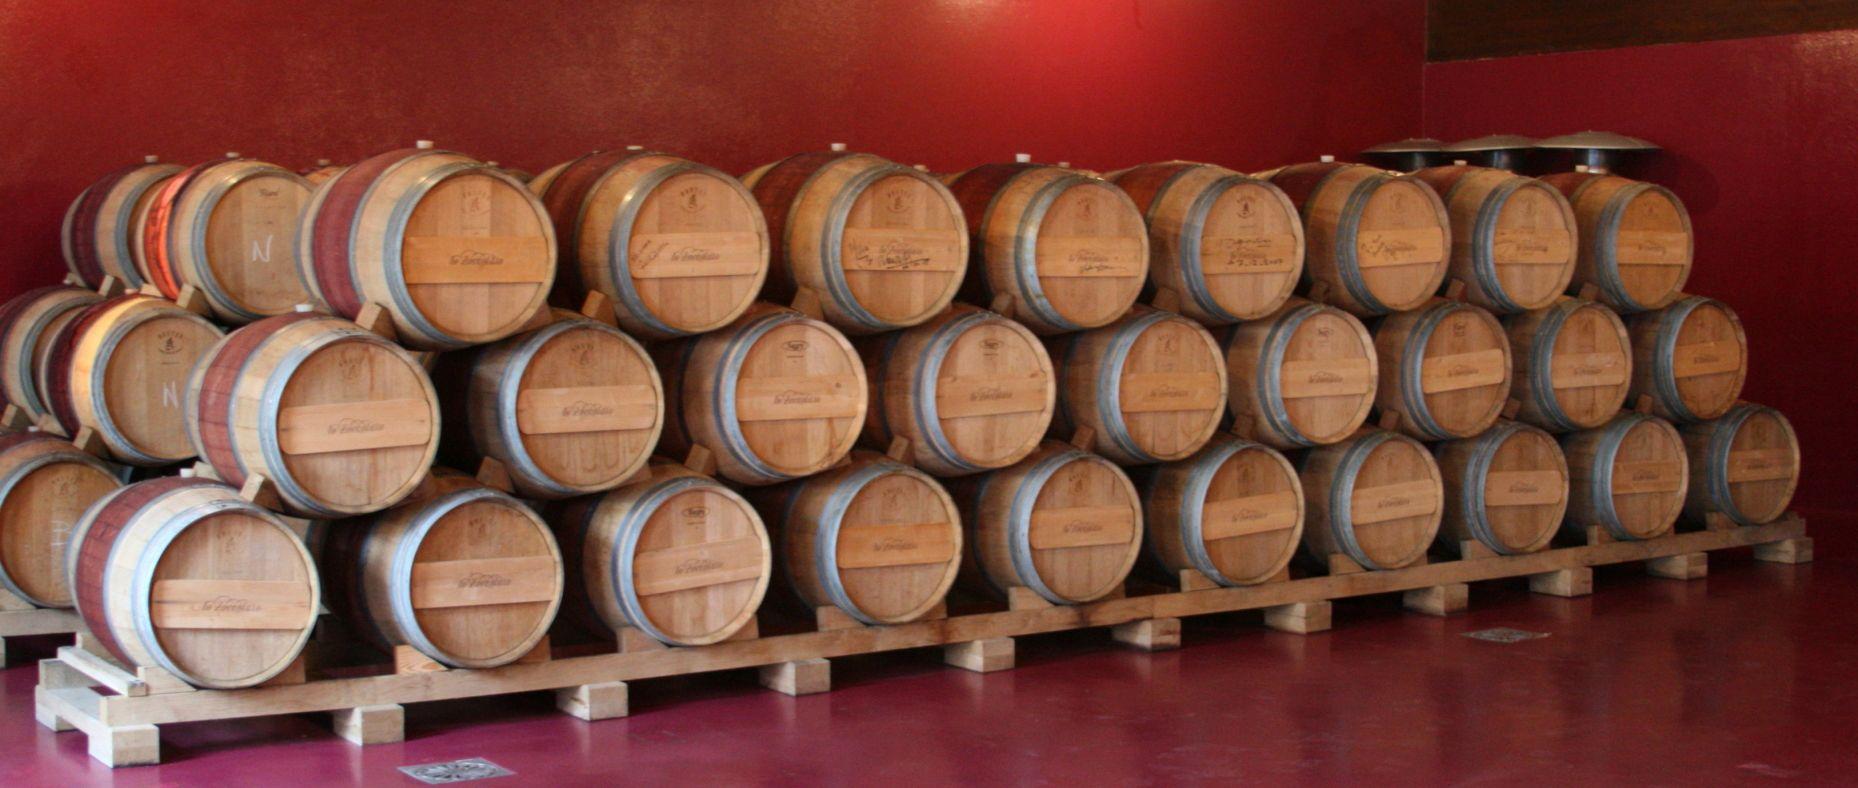 The Cellar, Cascina lo Zoccolaio, Piemont